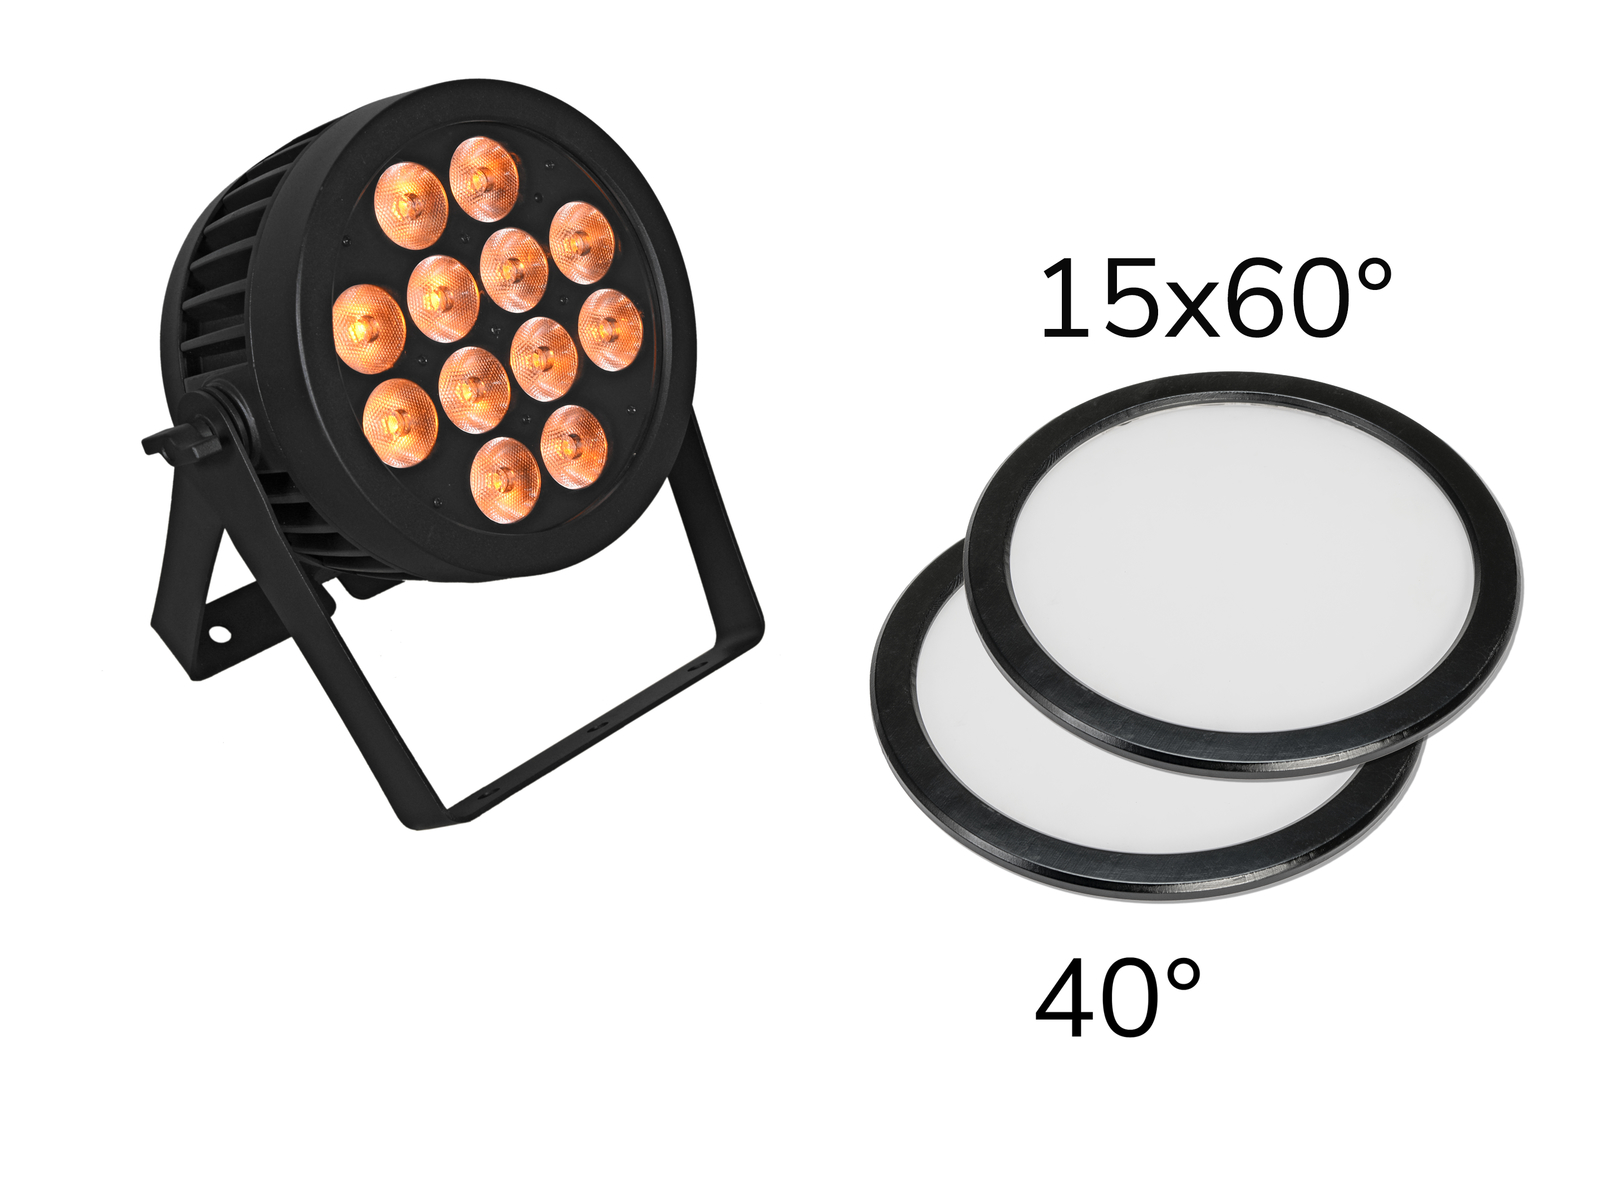 EUROLITE Set LED IP PAR 12x9W SCL Spot + 2x Diffusorscheibe (15x60° und 40°)